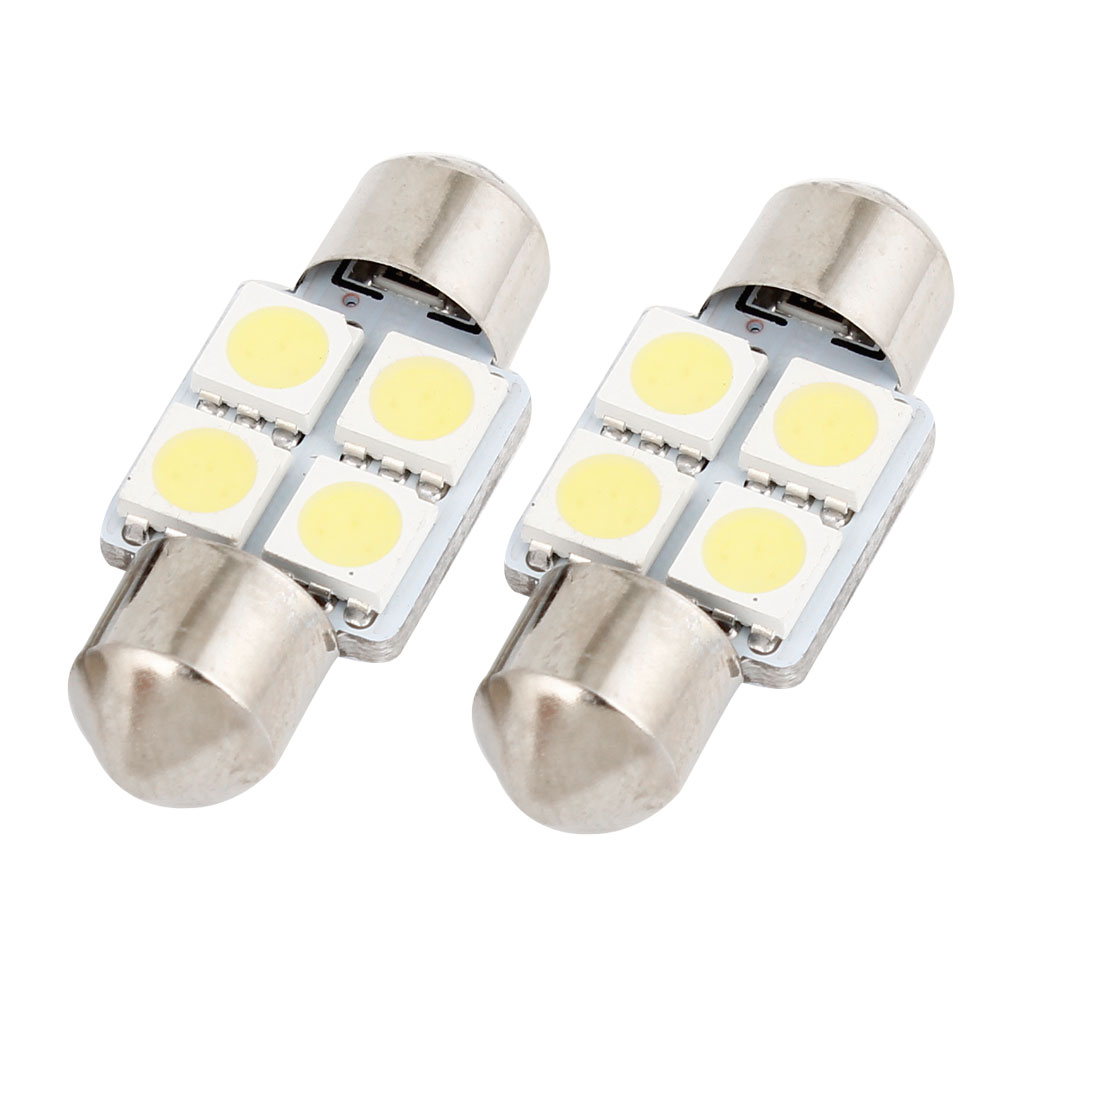 "2PCS 31mm 1.25"" 5050 SMD 4 White LED Festoon Dome Light 3175 DE3021 Internal"